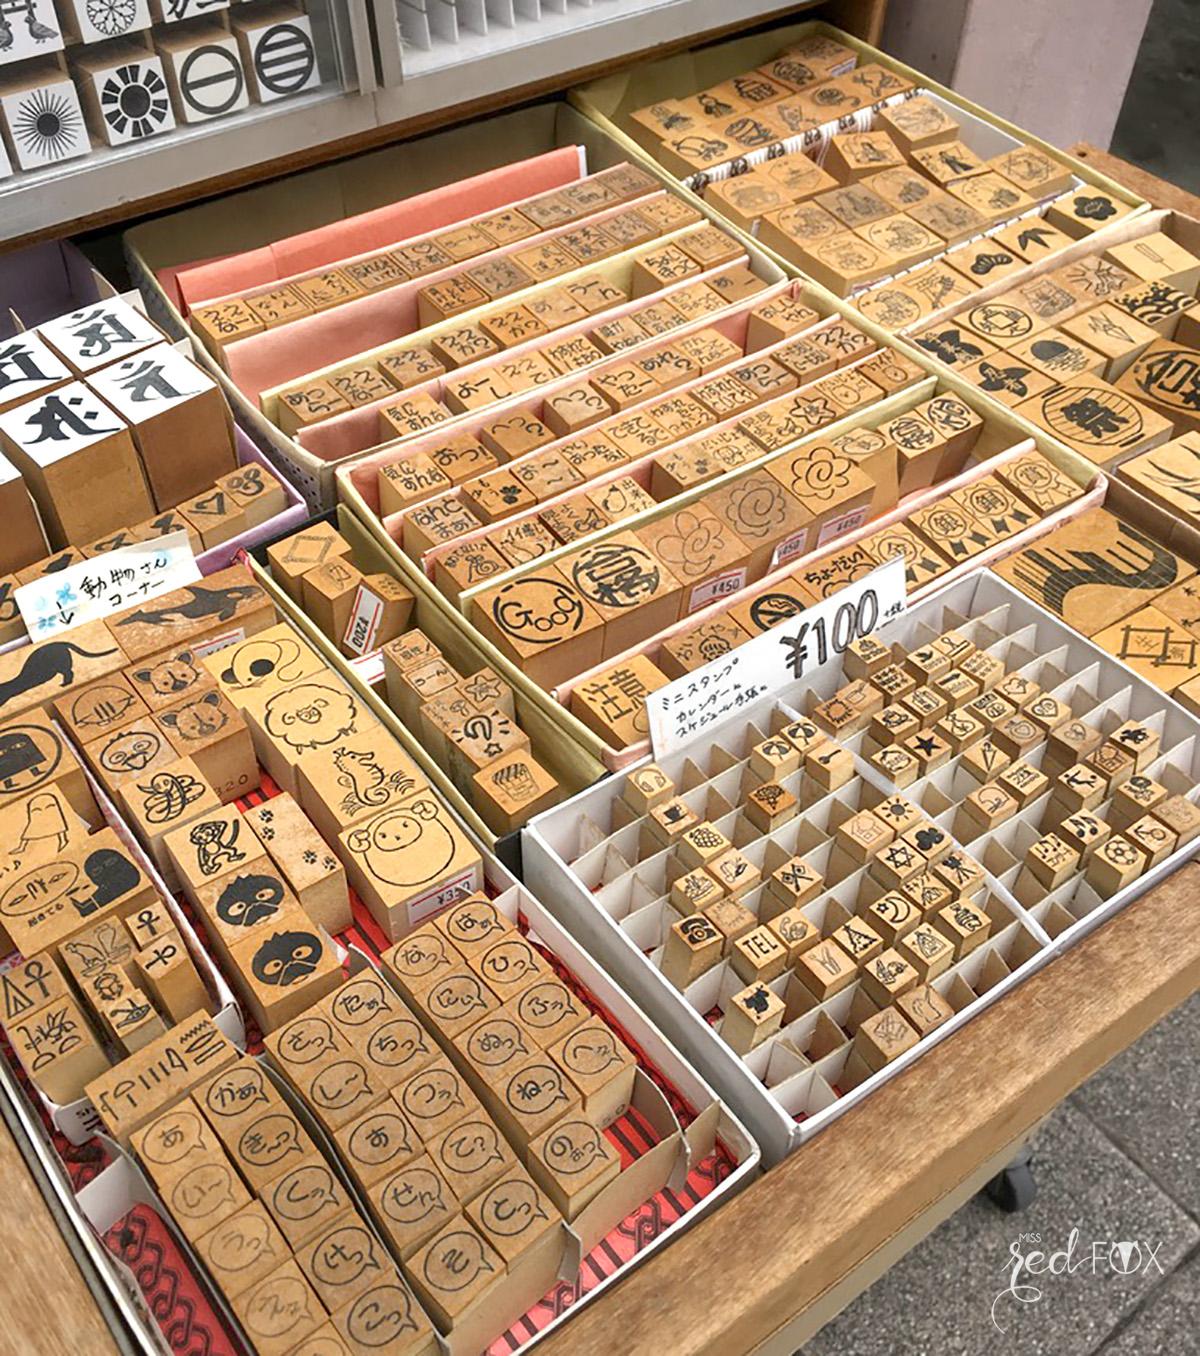 missredfox - Japan - Papeterien - Kyoto - Stempel